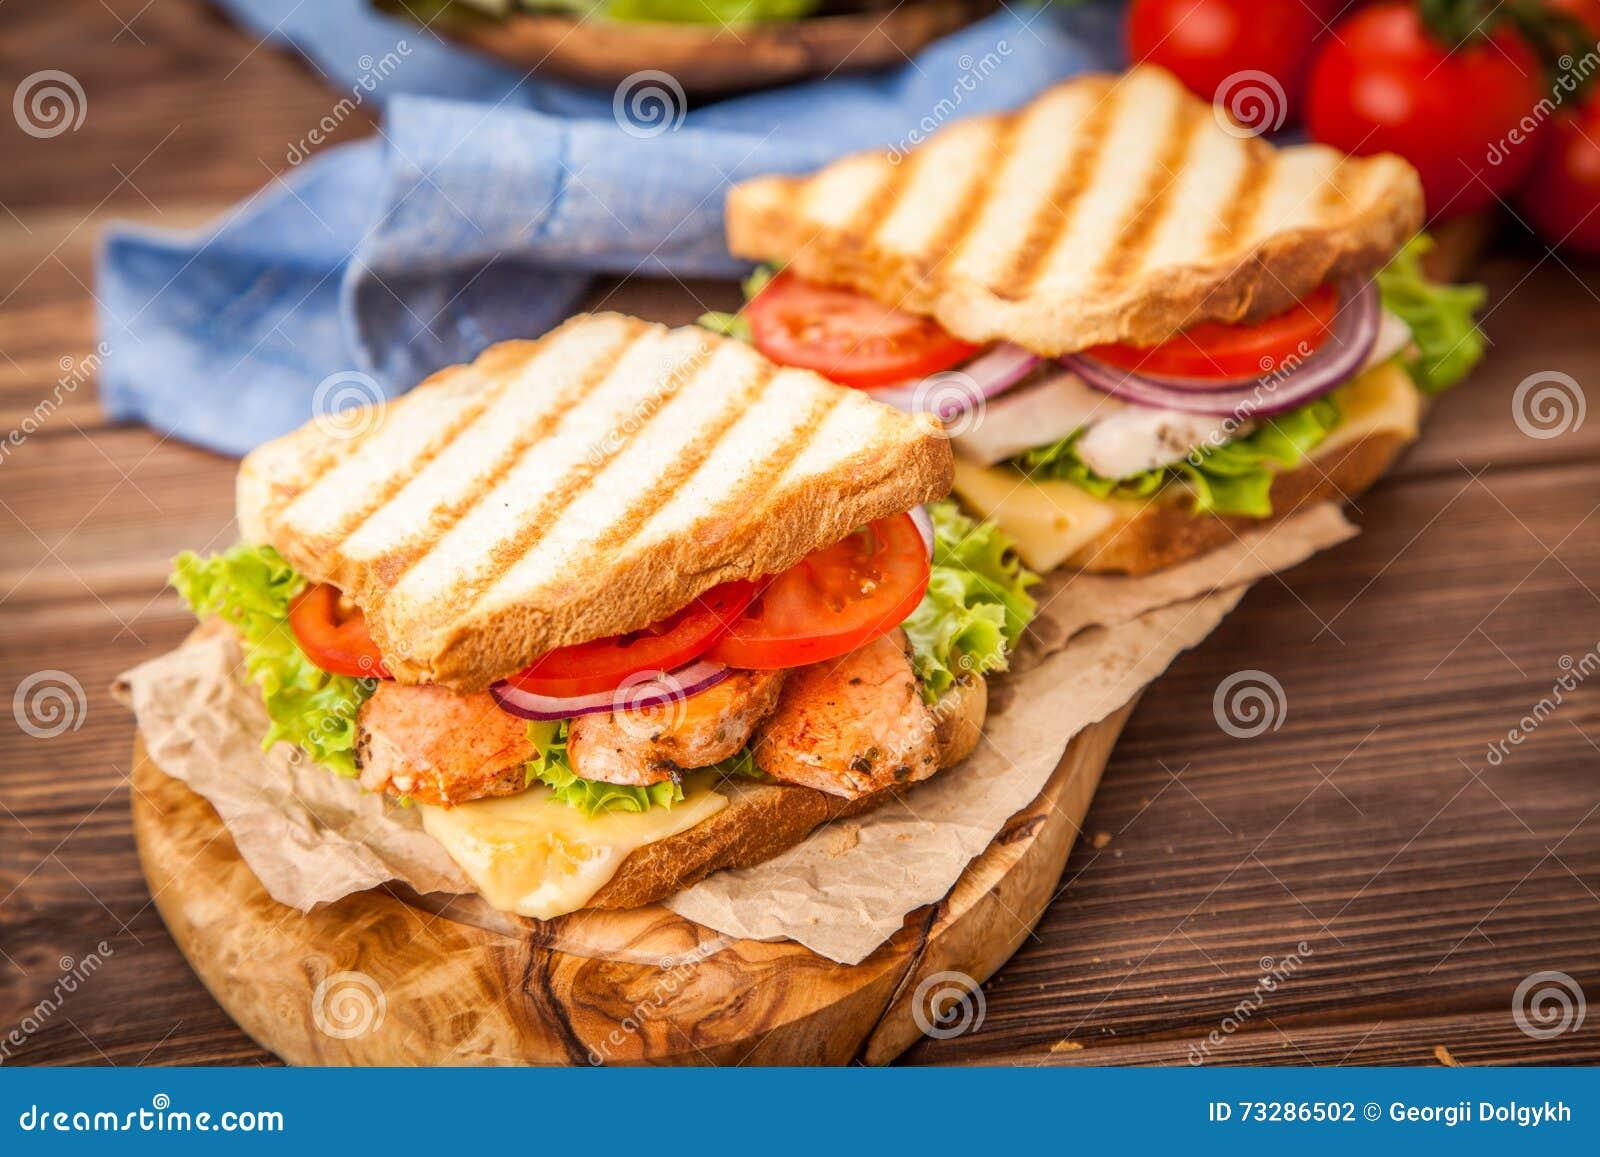 Grilled Chicken Sandwich Stock Photo Image Of Restaurant 73286502